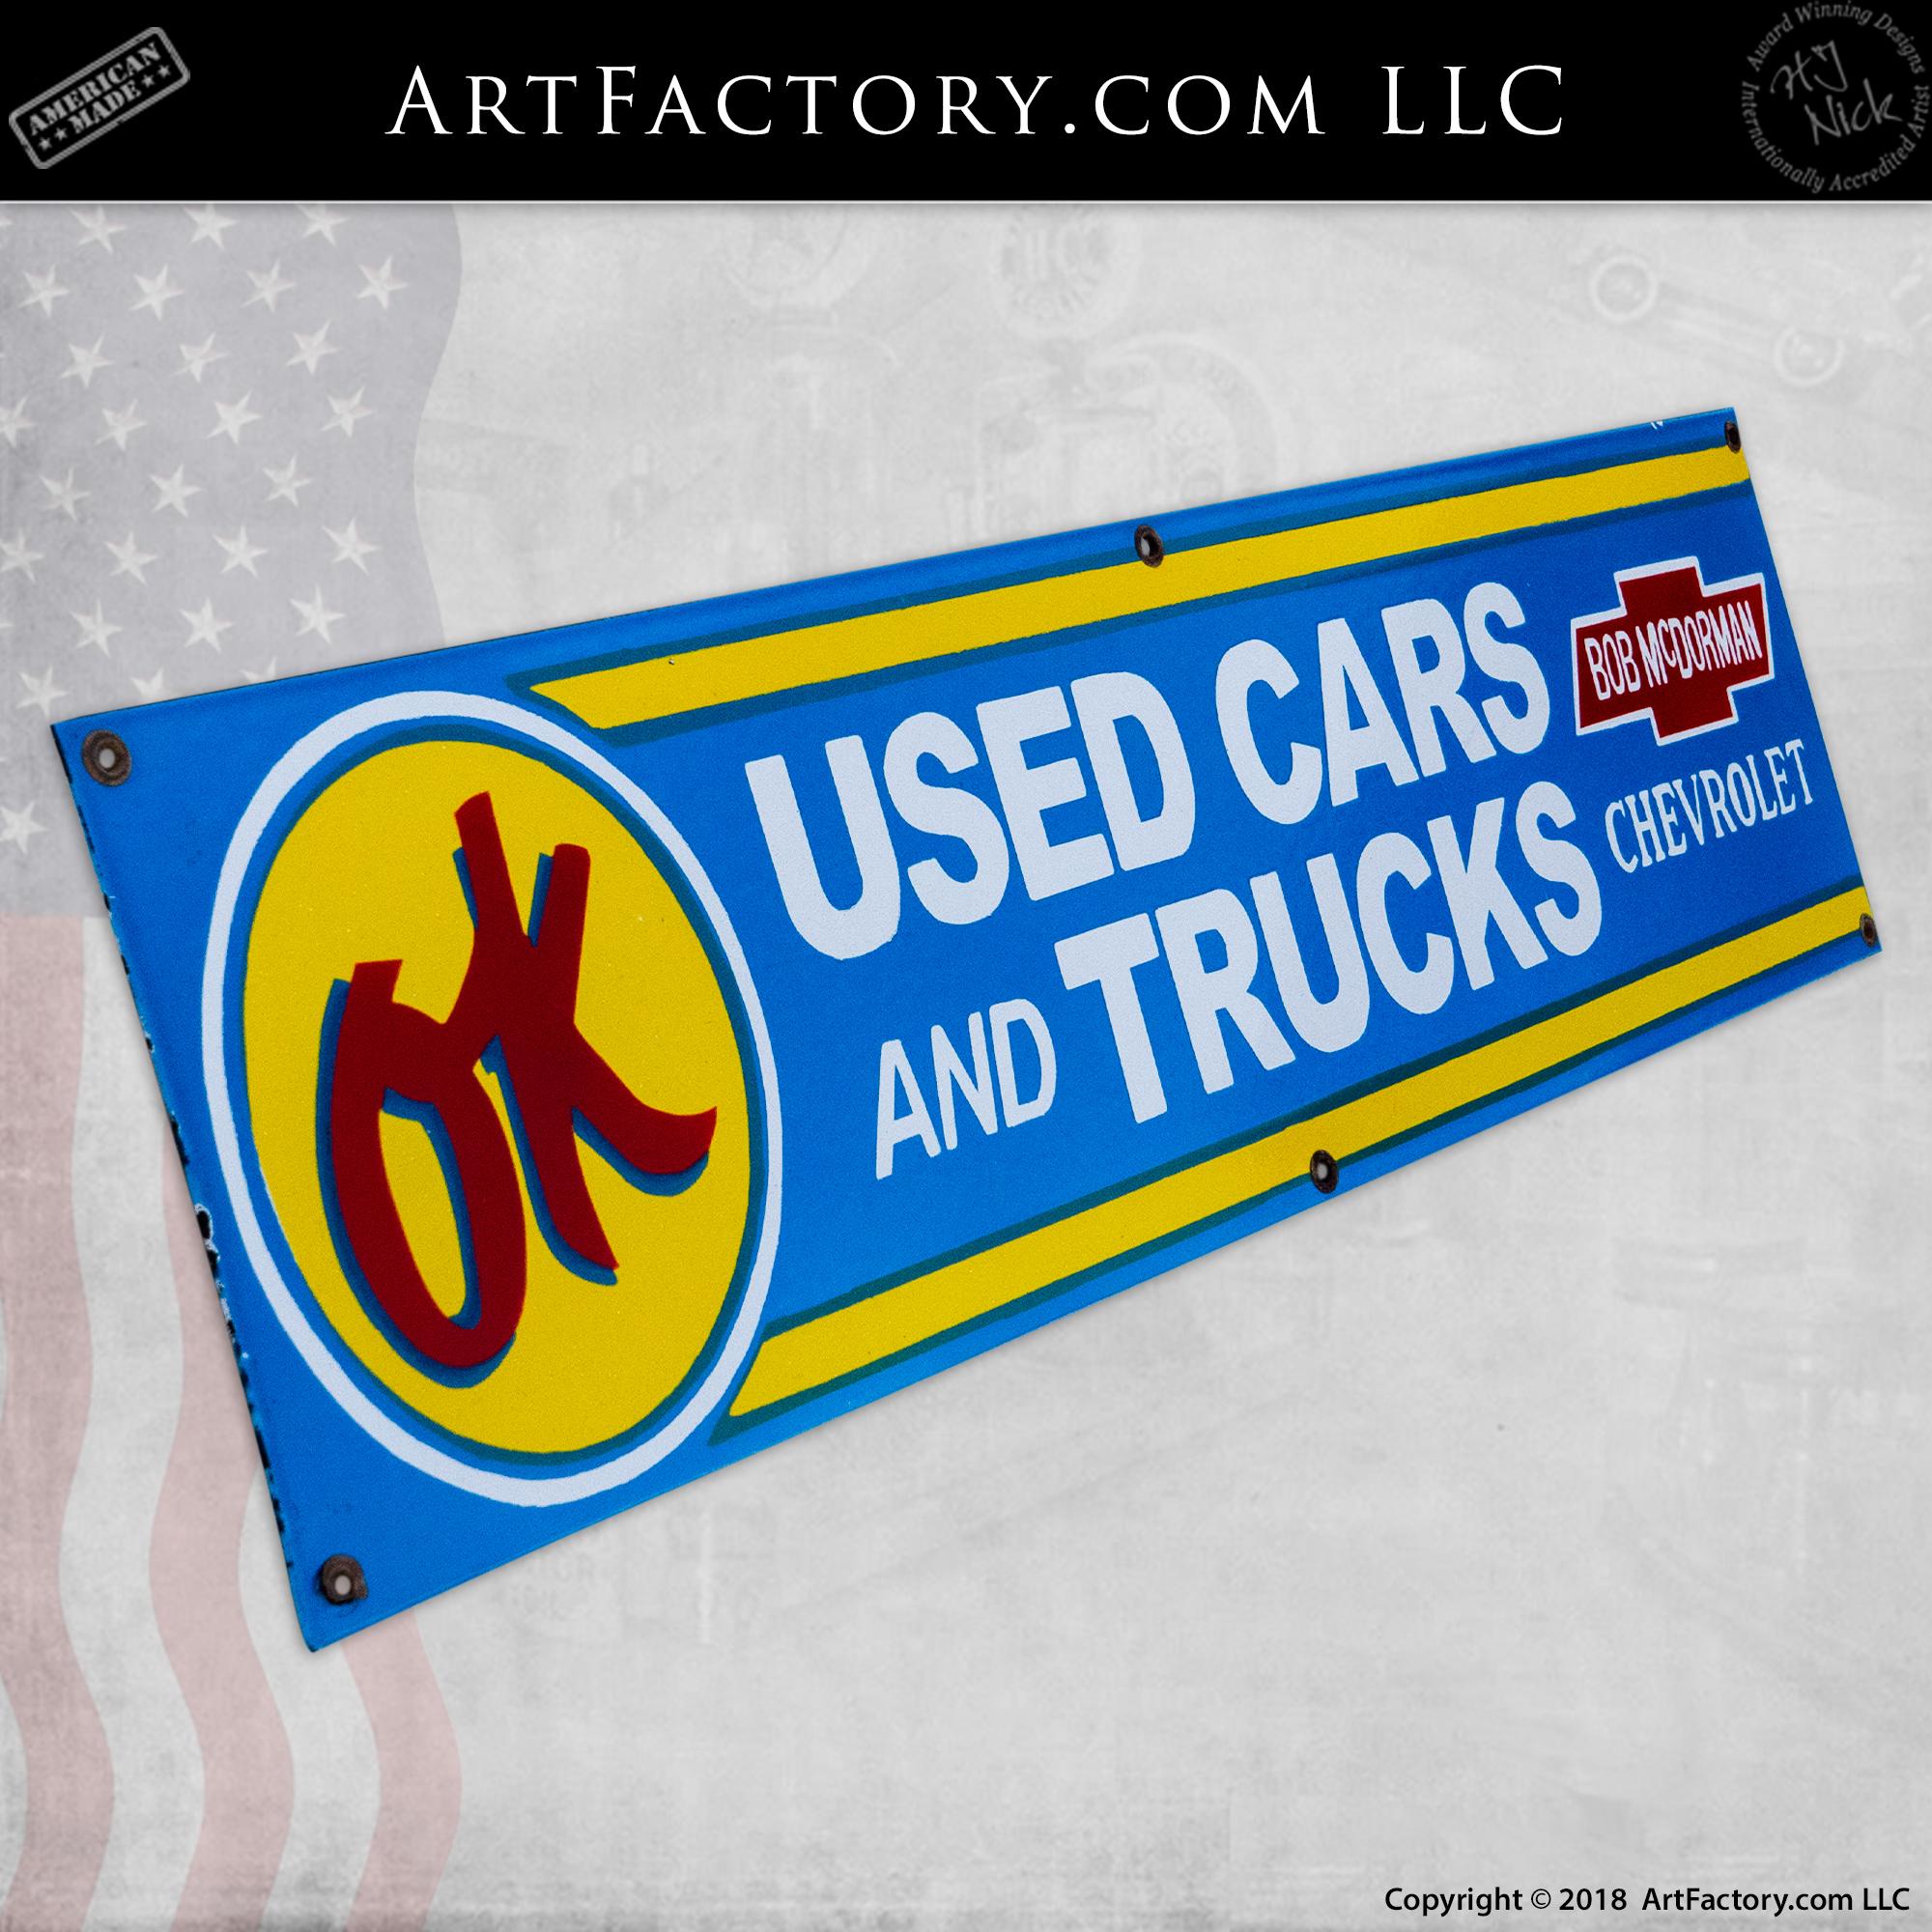 Vintage Ok Sign Bob Mcdorman Chevrolet Used Cars Trucks